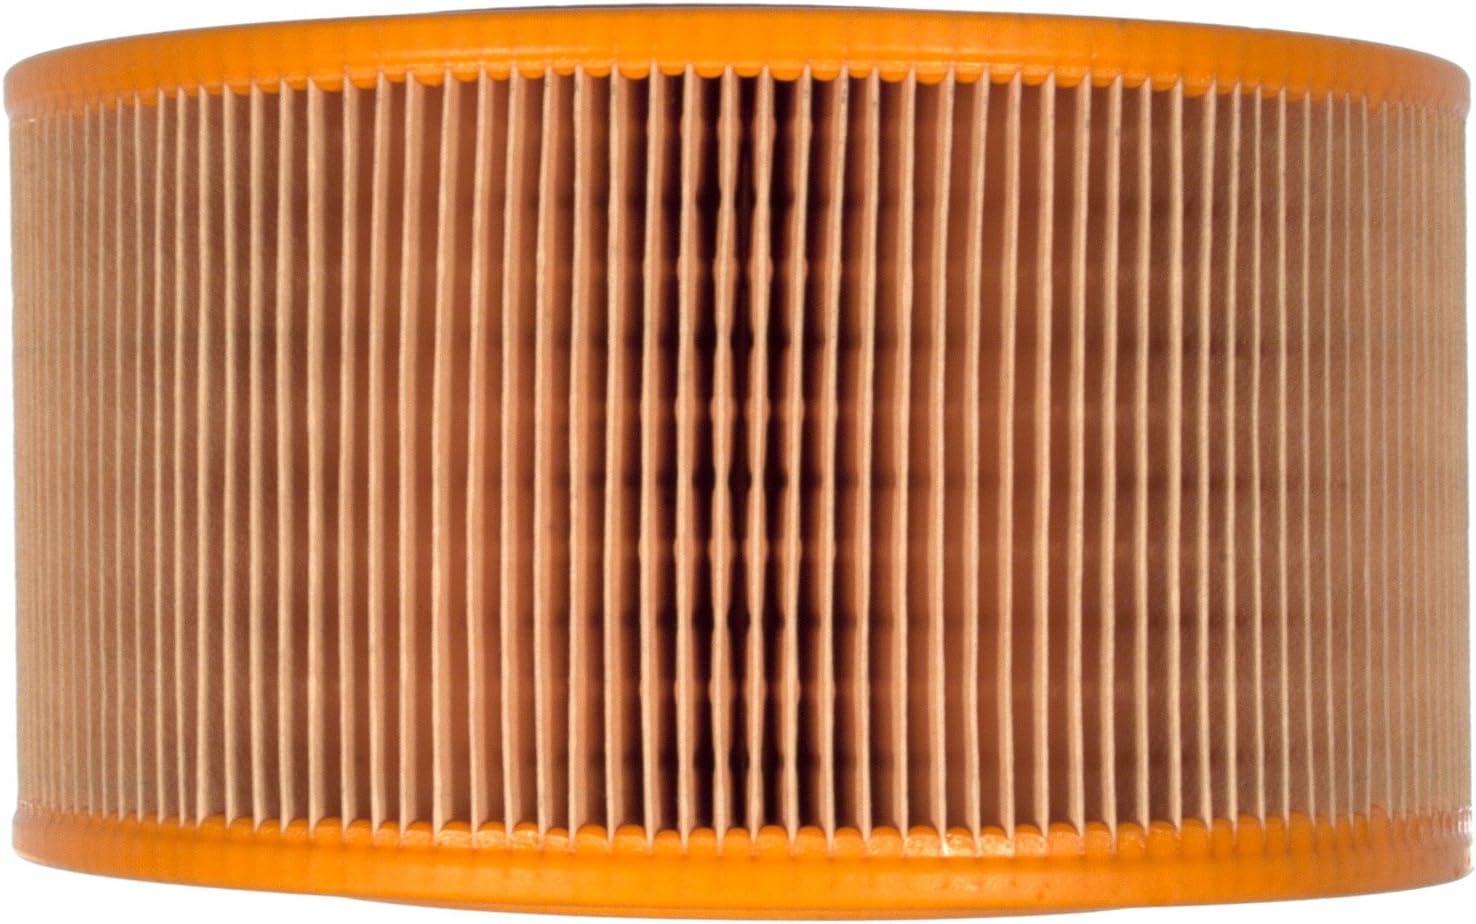 MAHLE Original LX 720 Air Filter